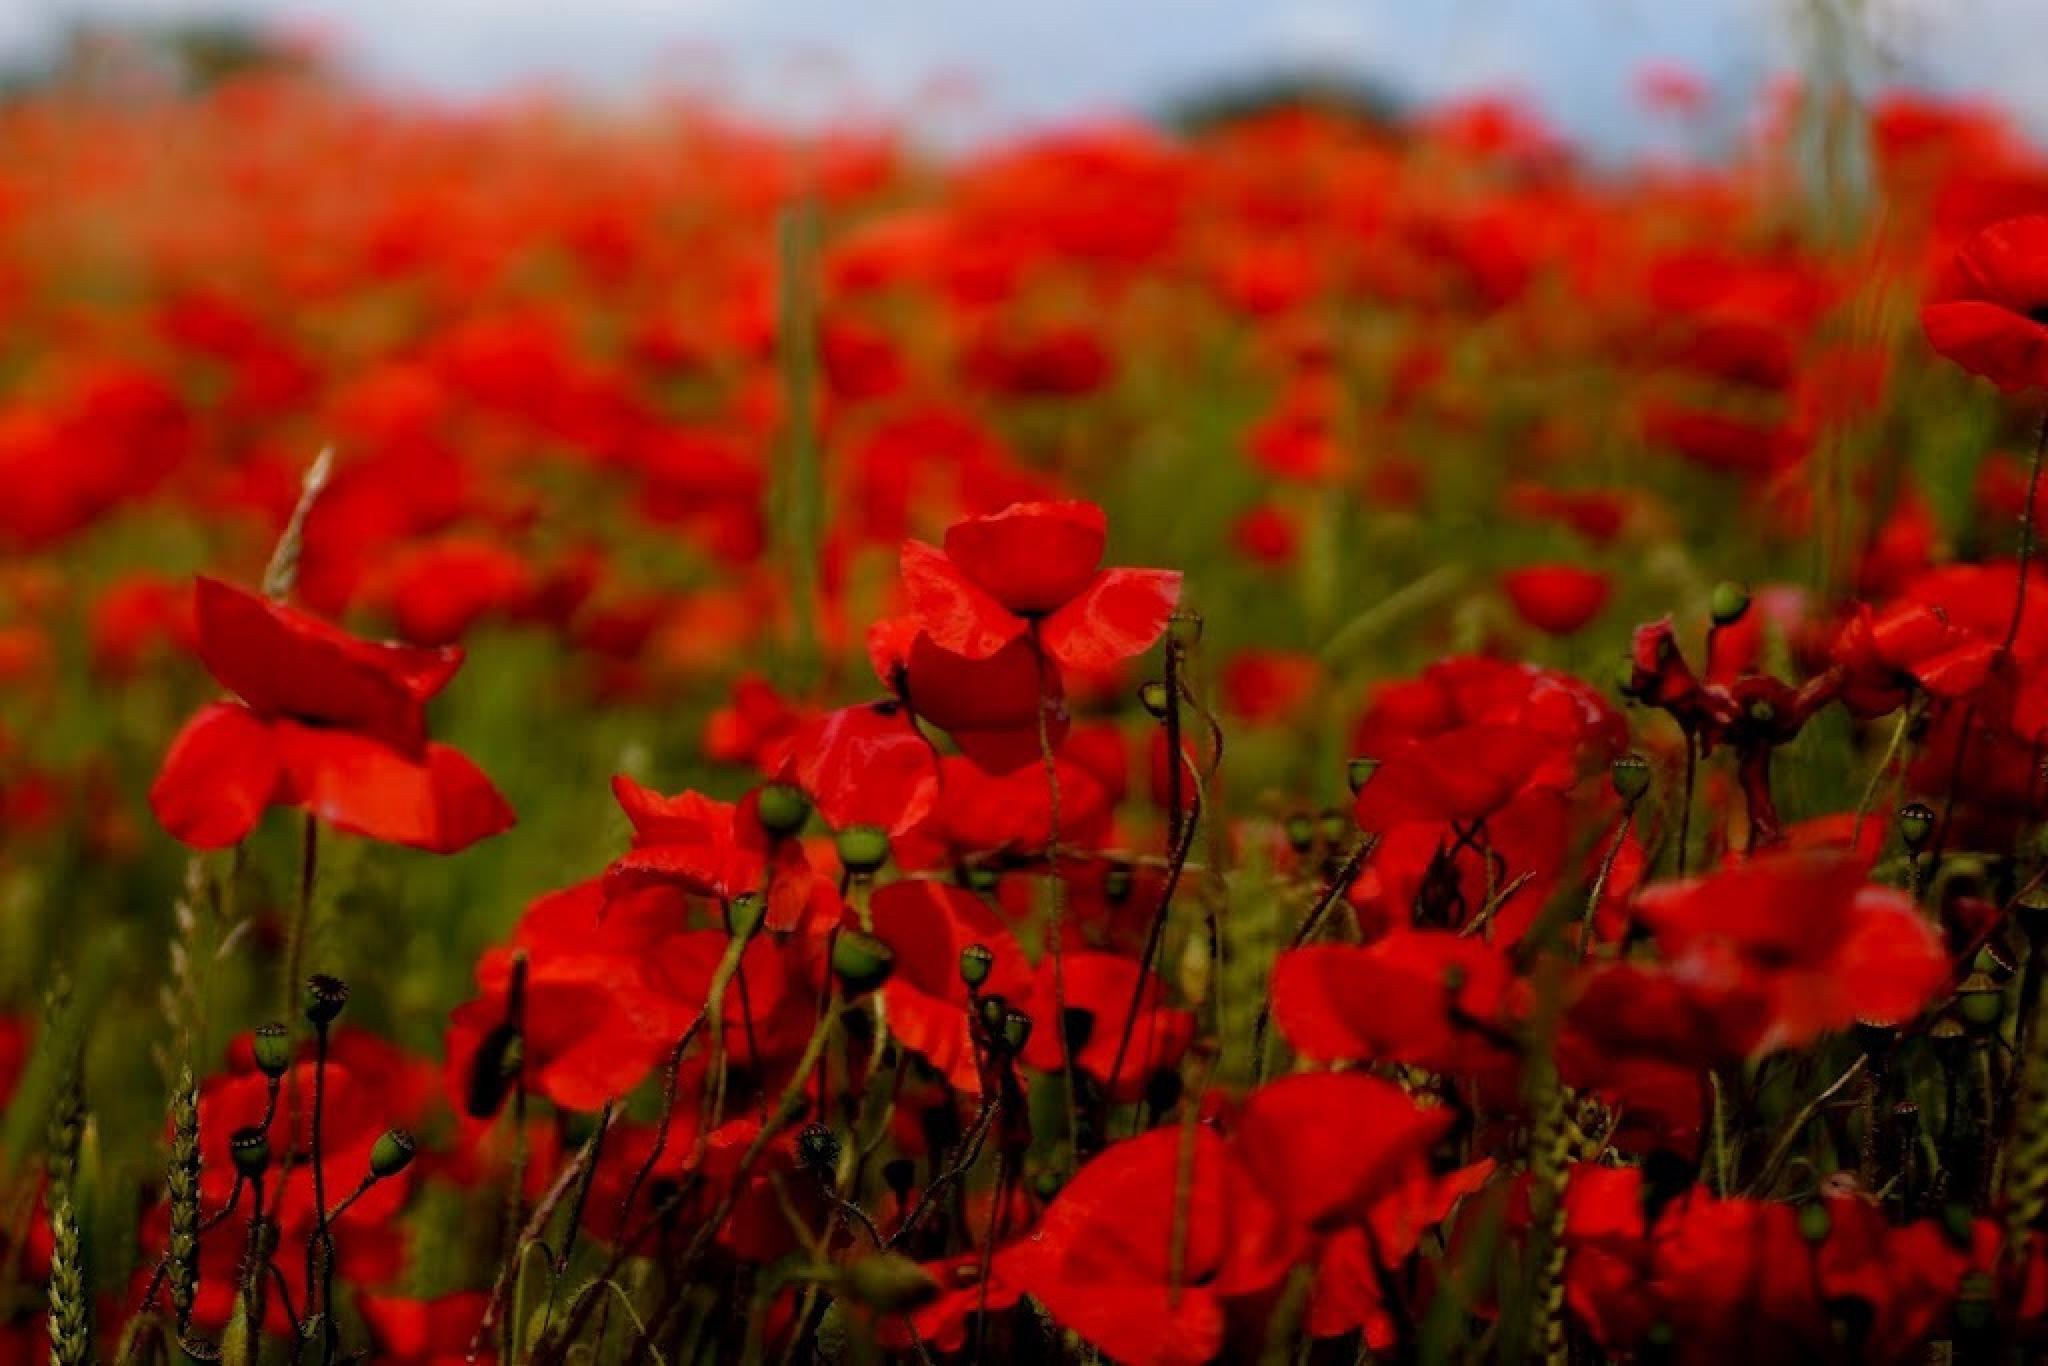 Poppy Delight by Fi Ona H